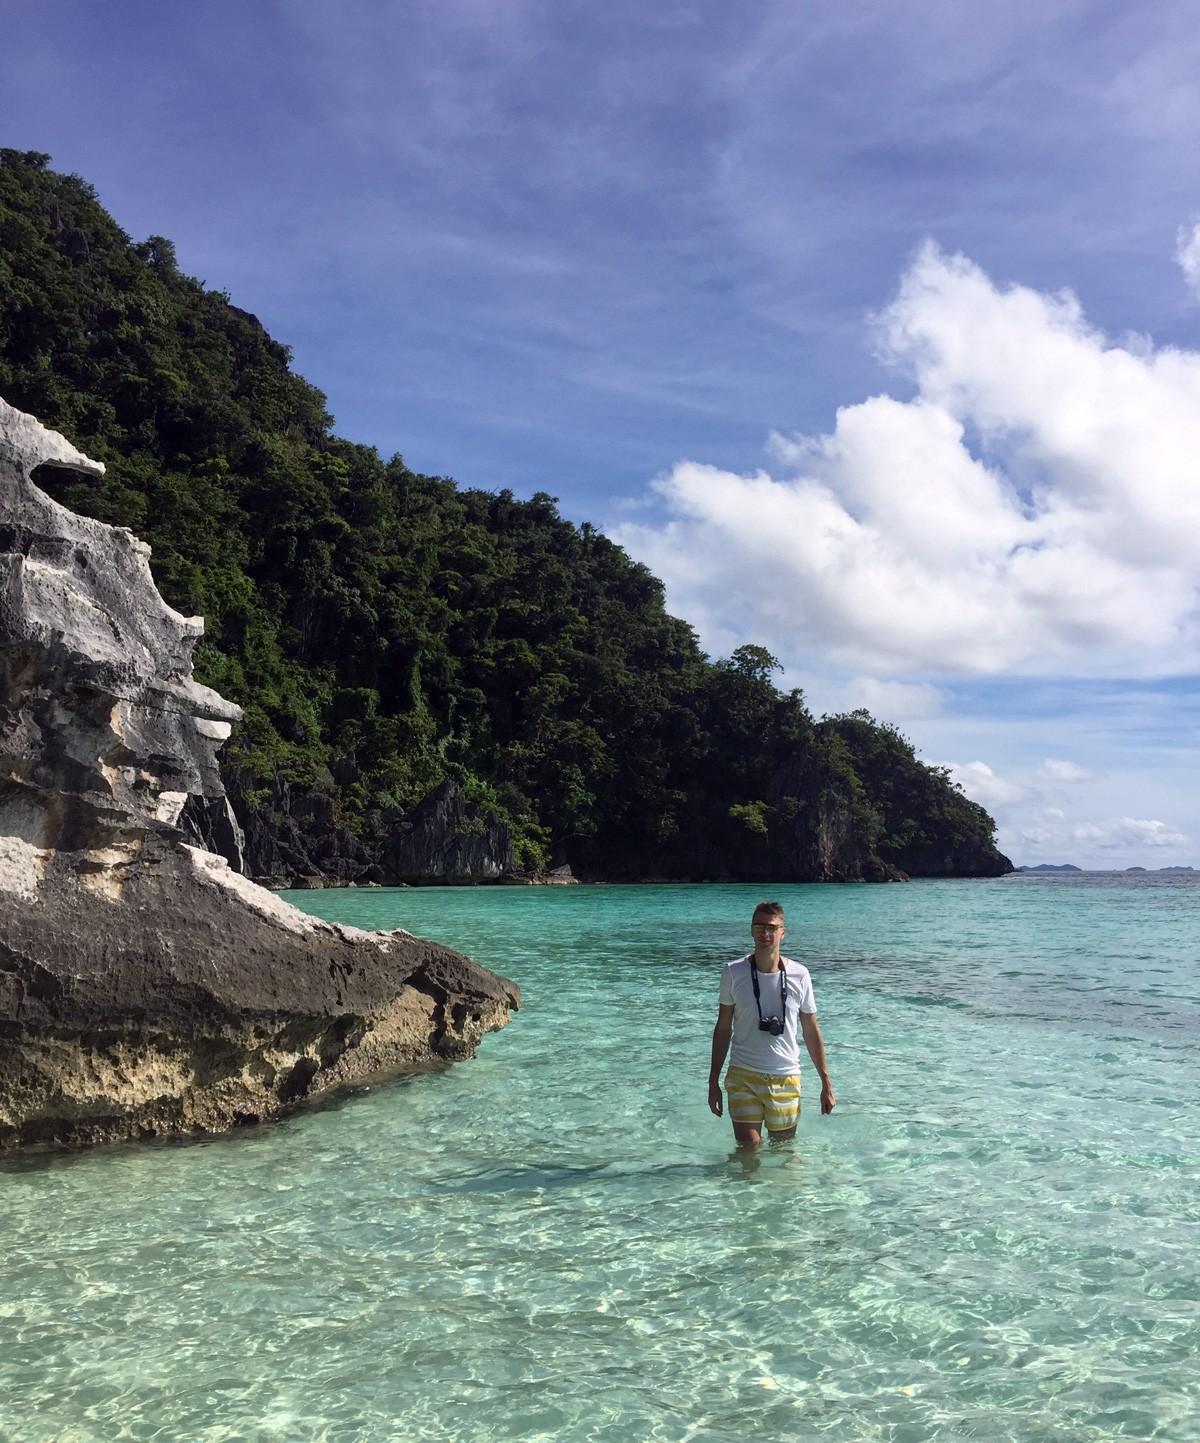 Andrei on banul beach, Palawan - Travelblogstories